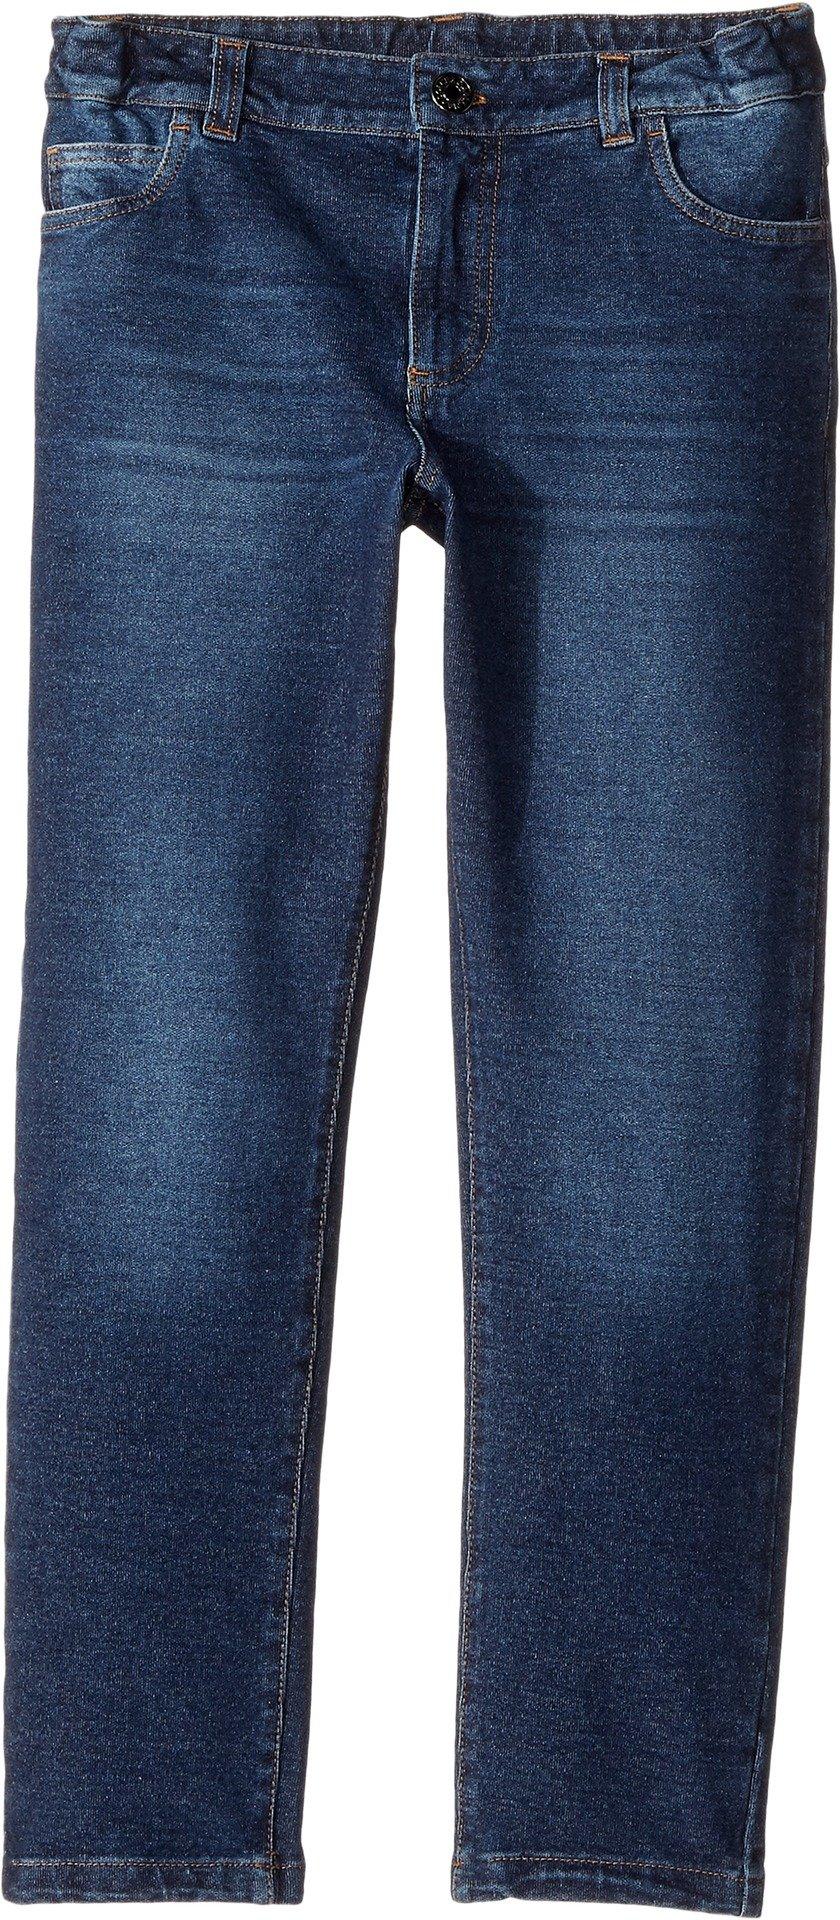 Dolce & Gabbana Kids  Baby Boy's Washed Denim (Toddler/Little Kids) Blue Jeans by Dolce & Gabbana